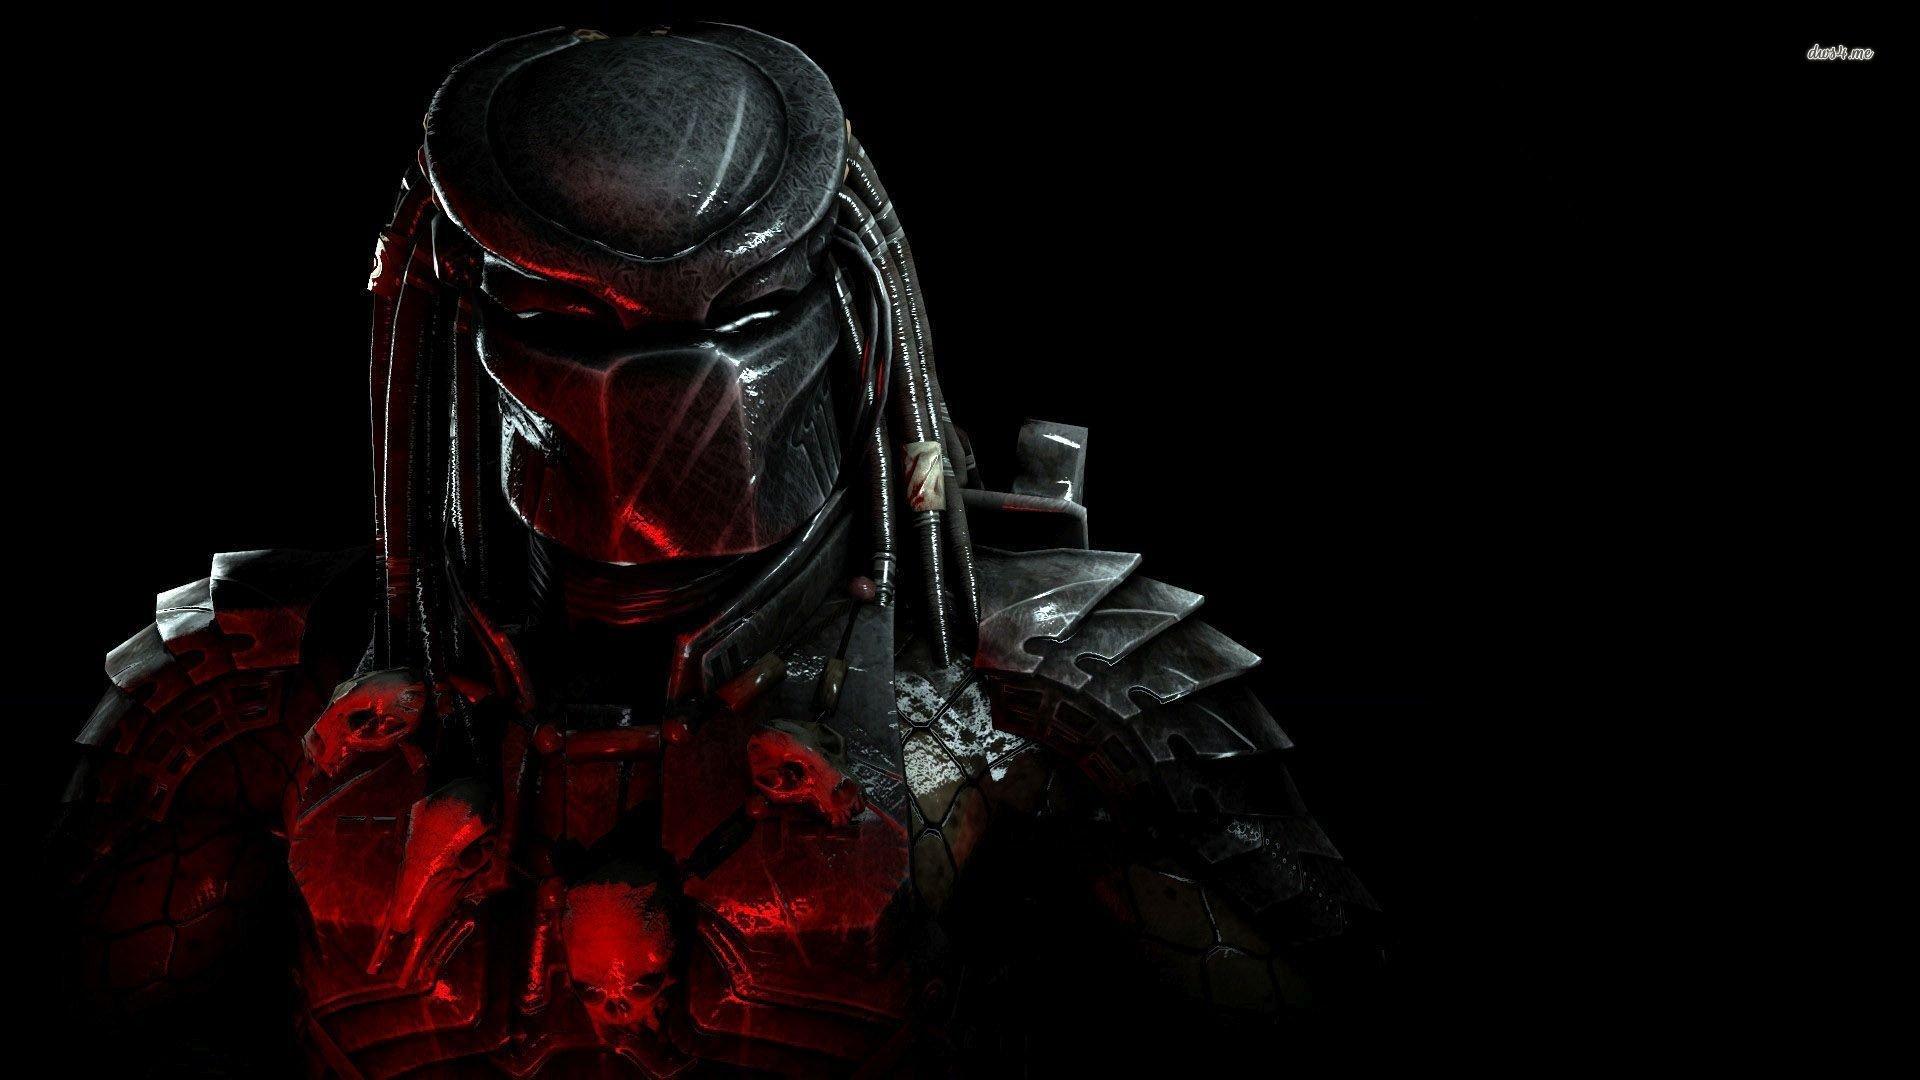 Alien Vs Predator Hd Wallpapers: Aliens Vs. Predator Full HD Wallpaper And Background Image